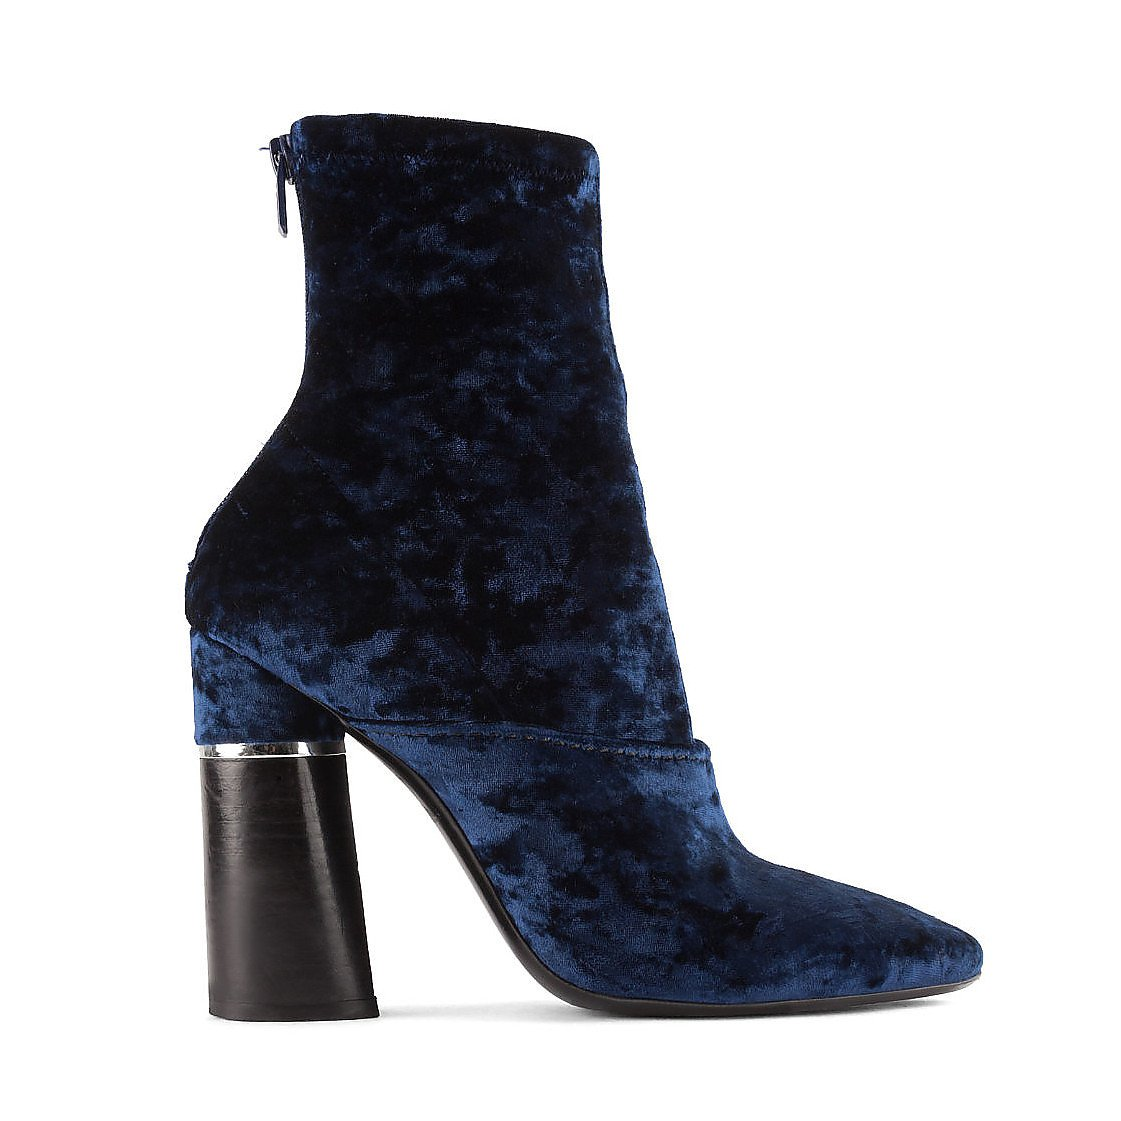 3.1 Phillip Lim Kyoto Velvet Heeled Sock Boots